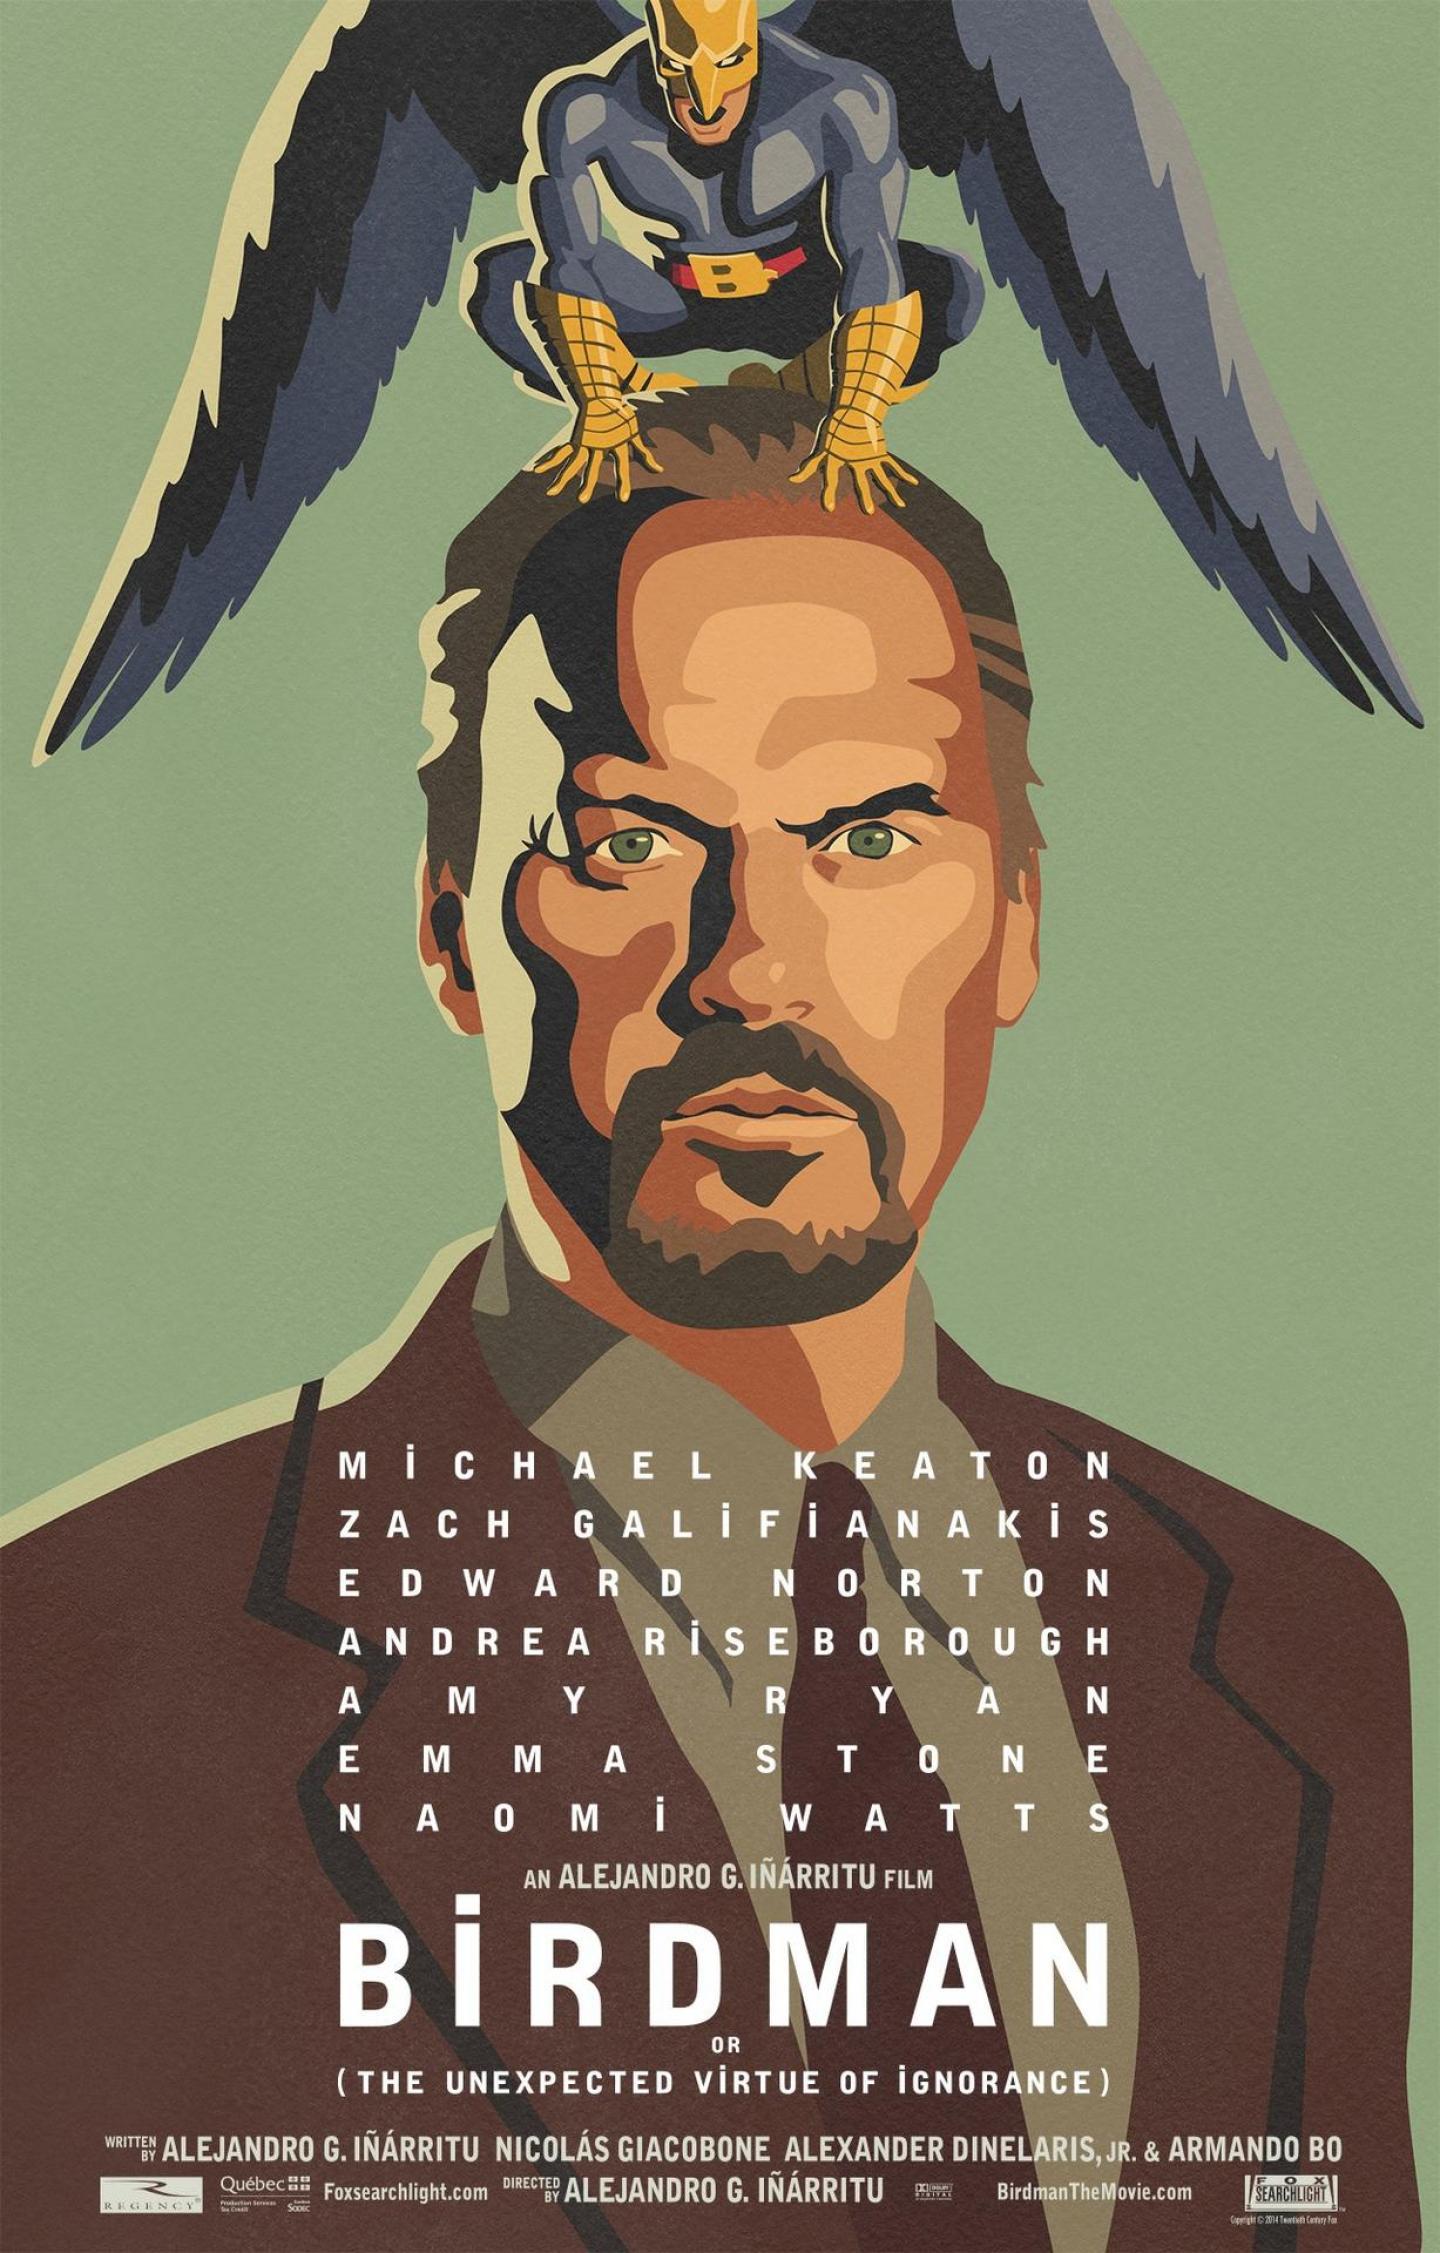 birdman1 Top 25 Films of 2014